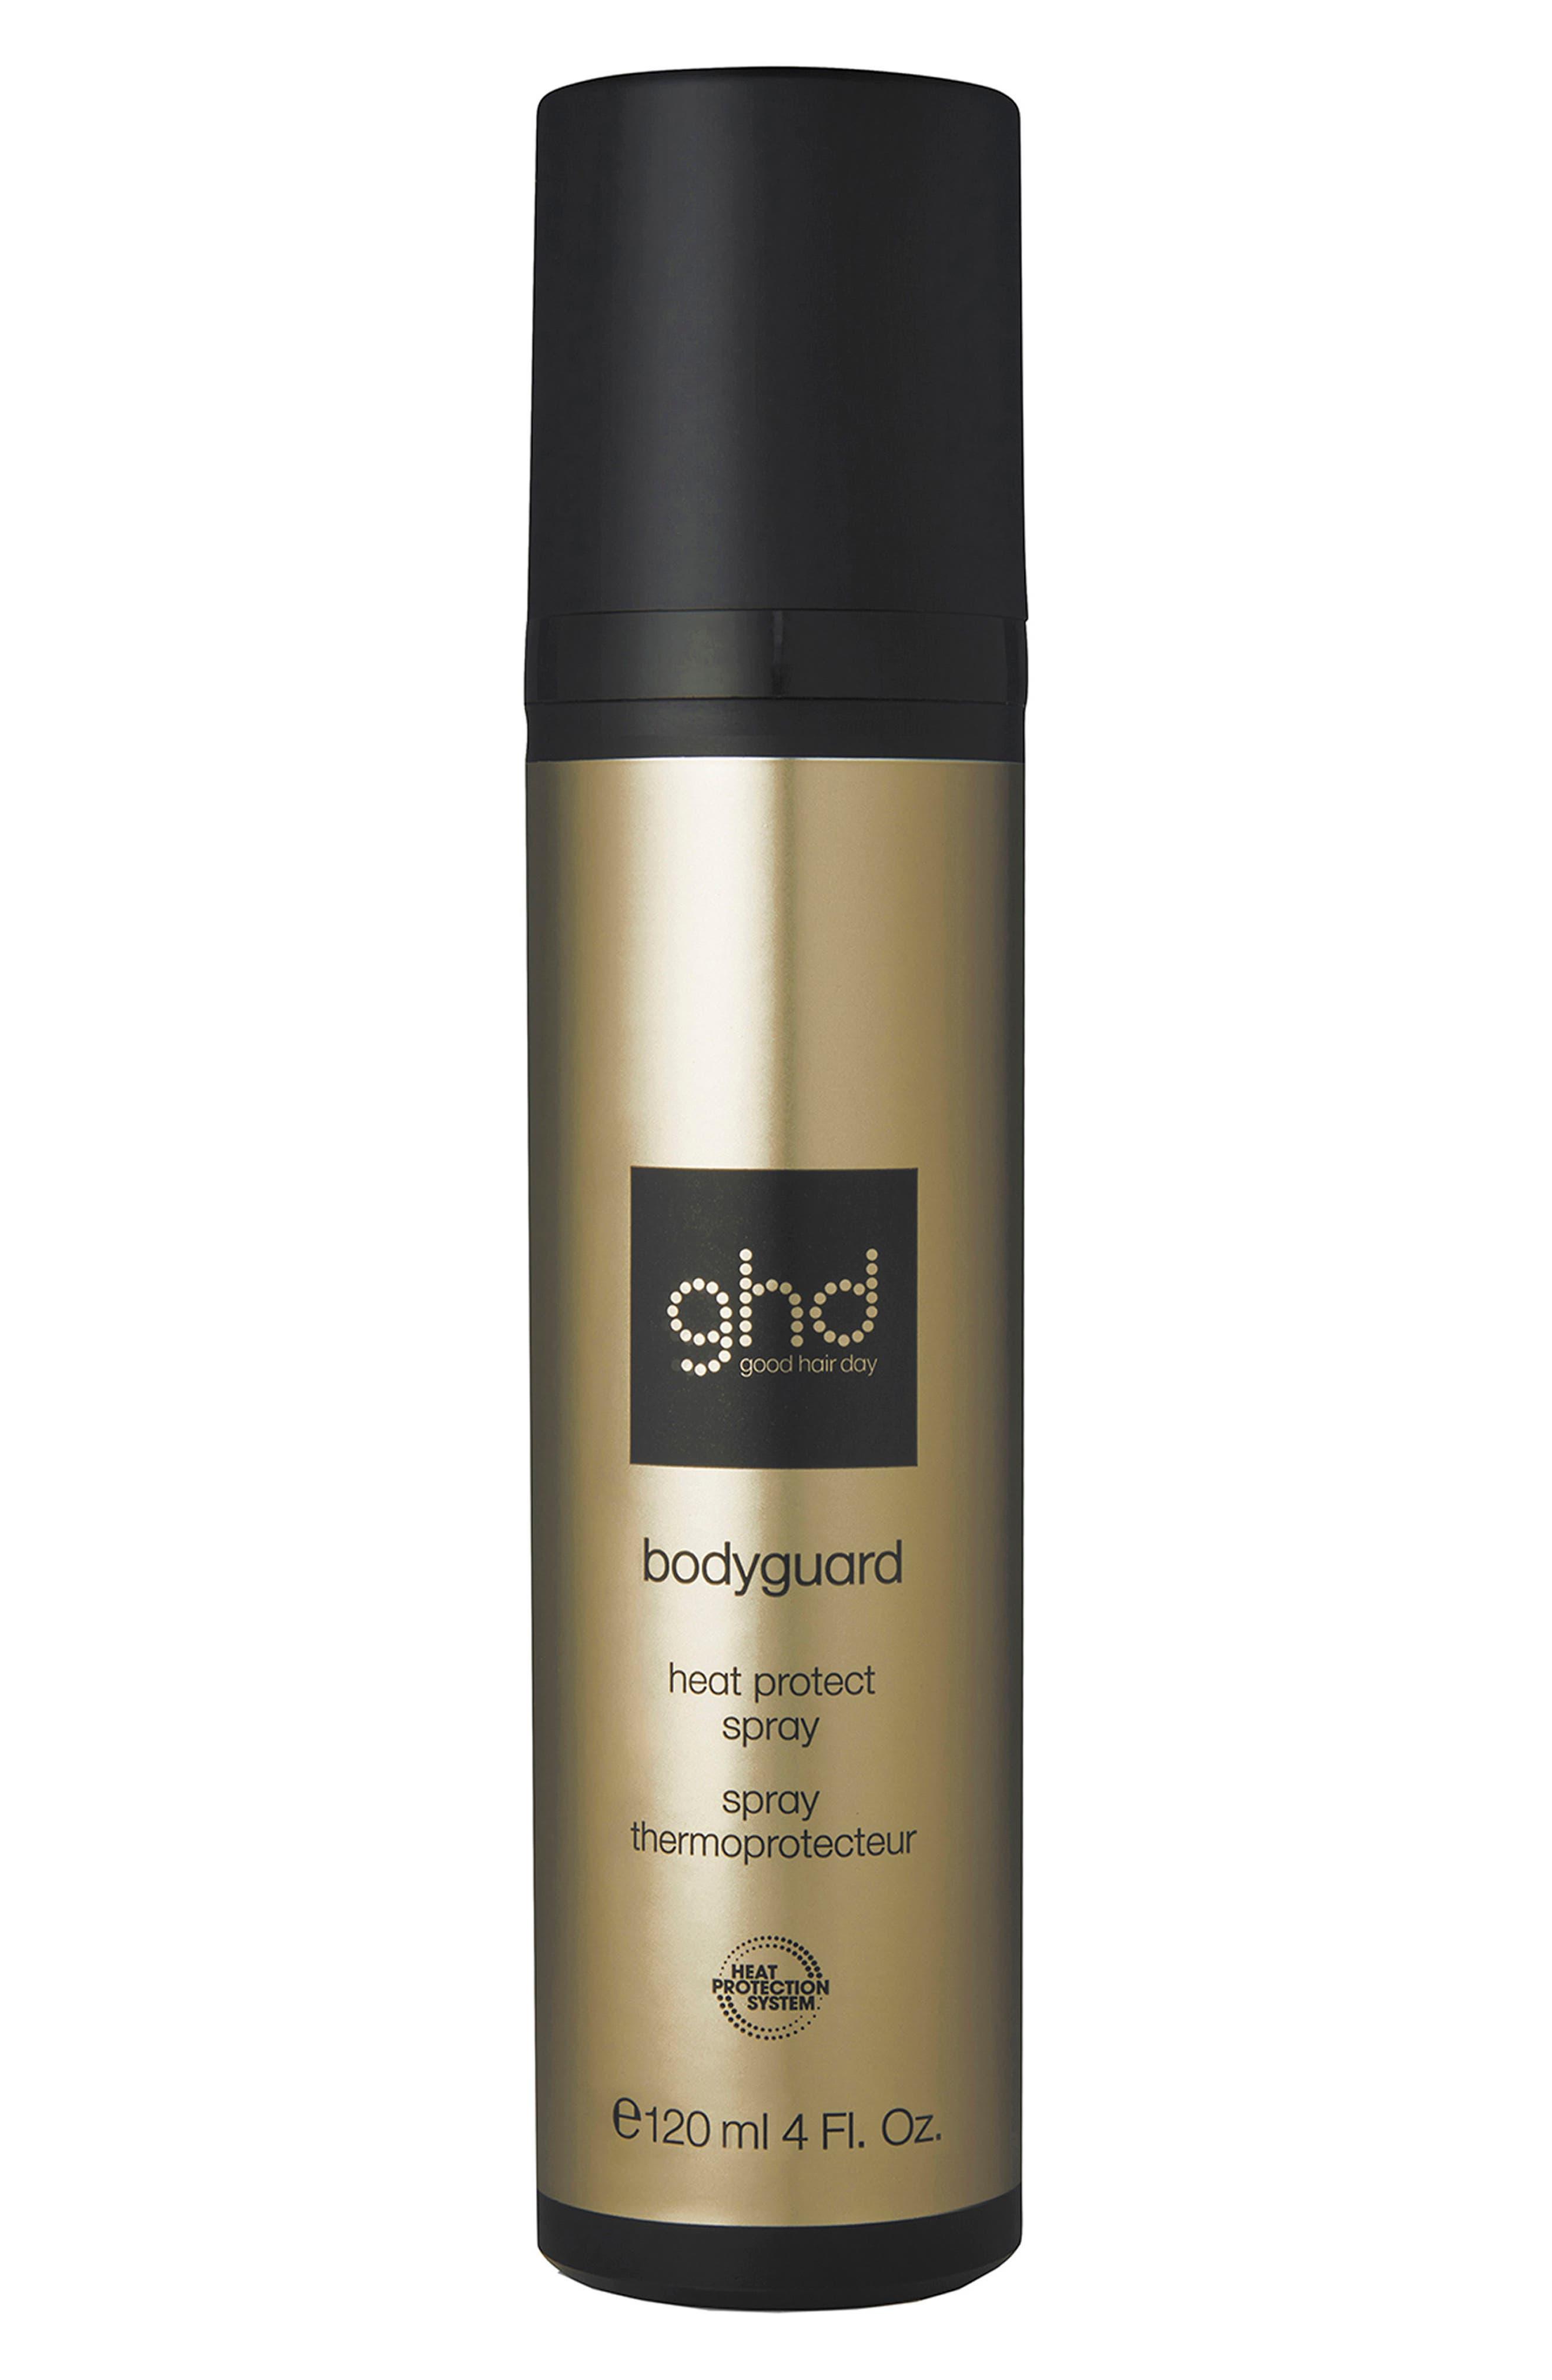 Bodyguard Heat Protect Spray